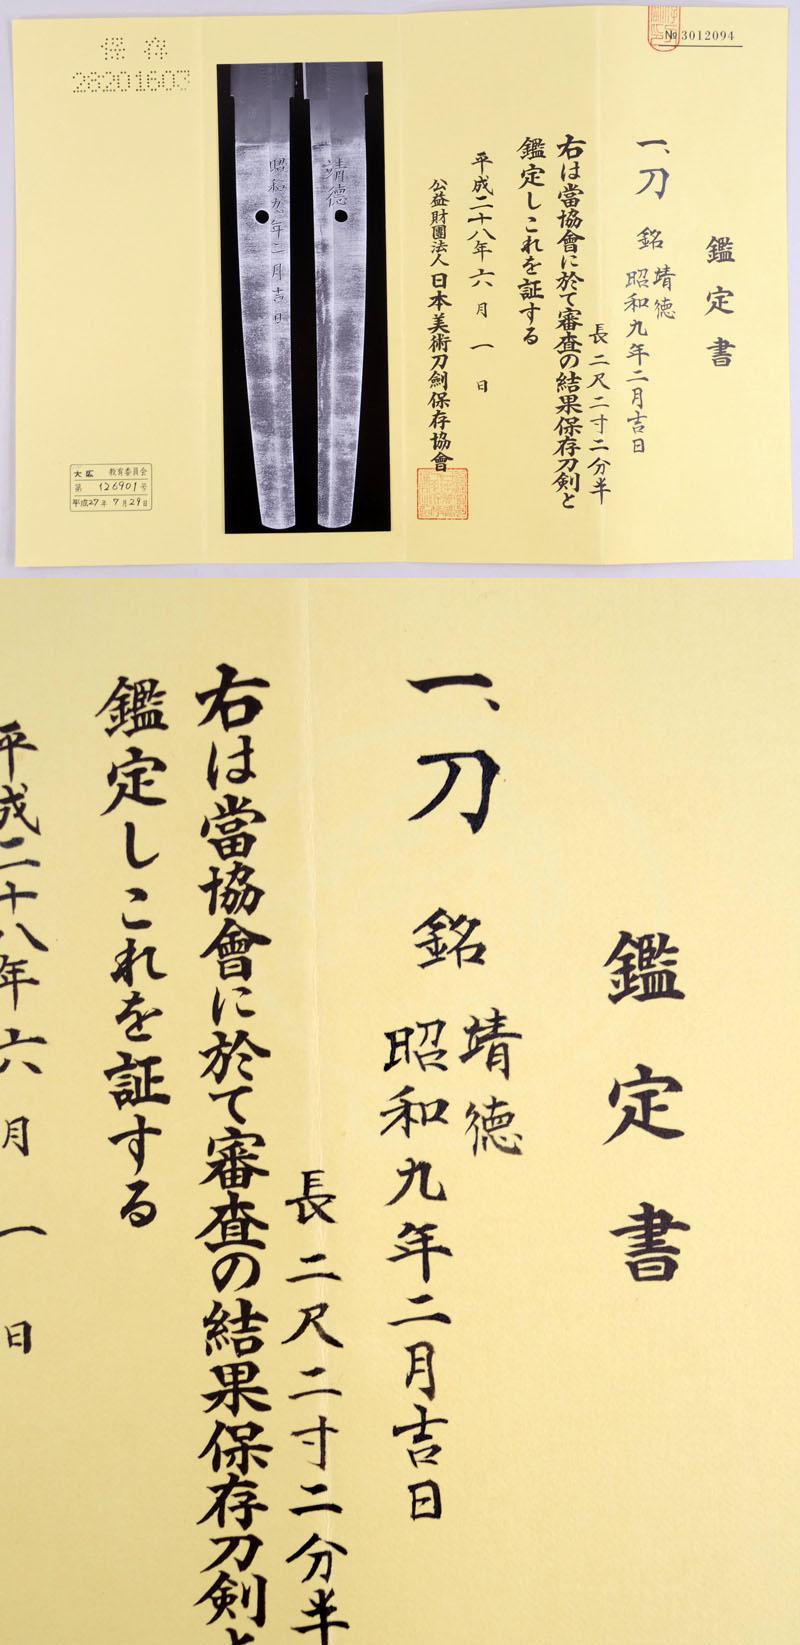 靖徳(梶山 靖徳) Picture of Certificate